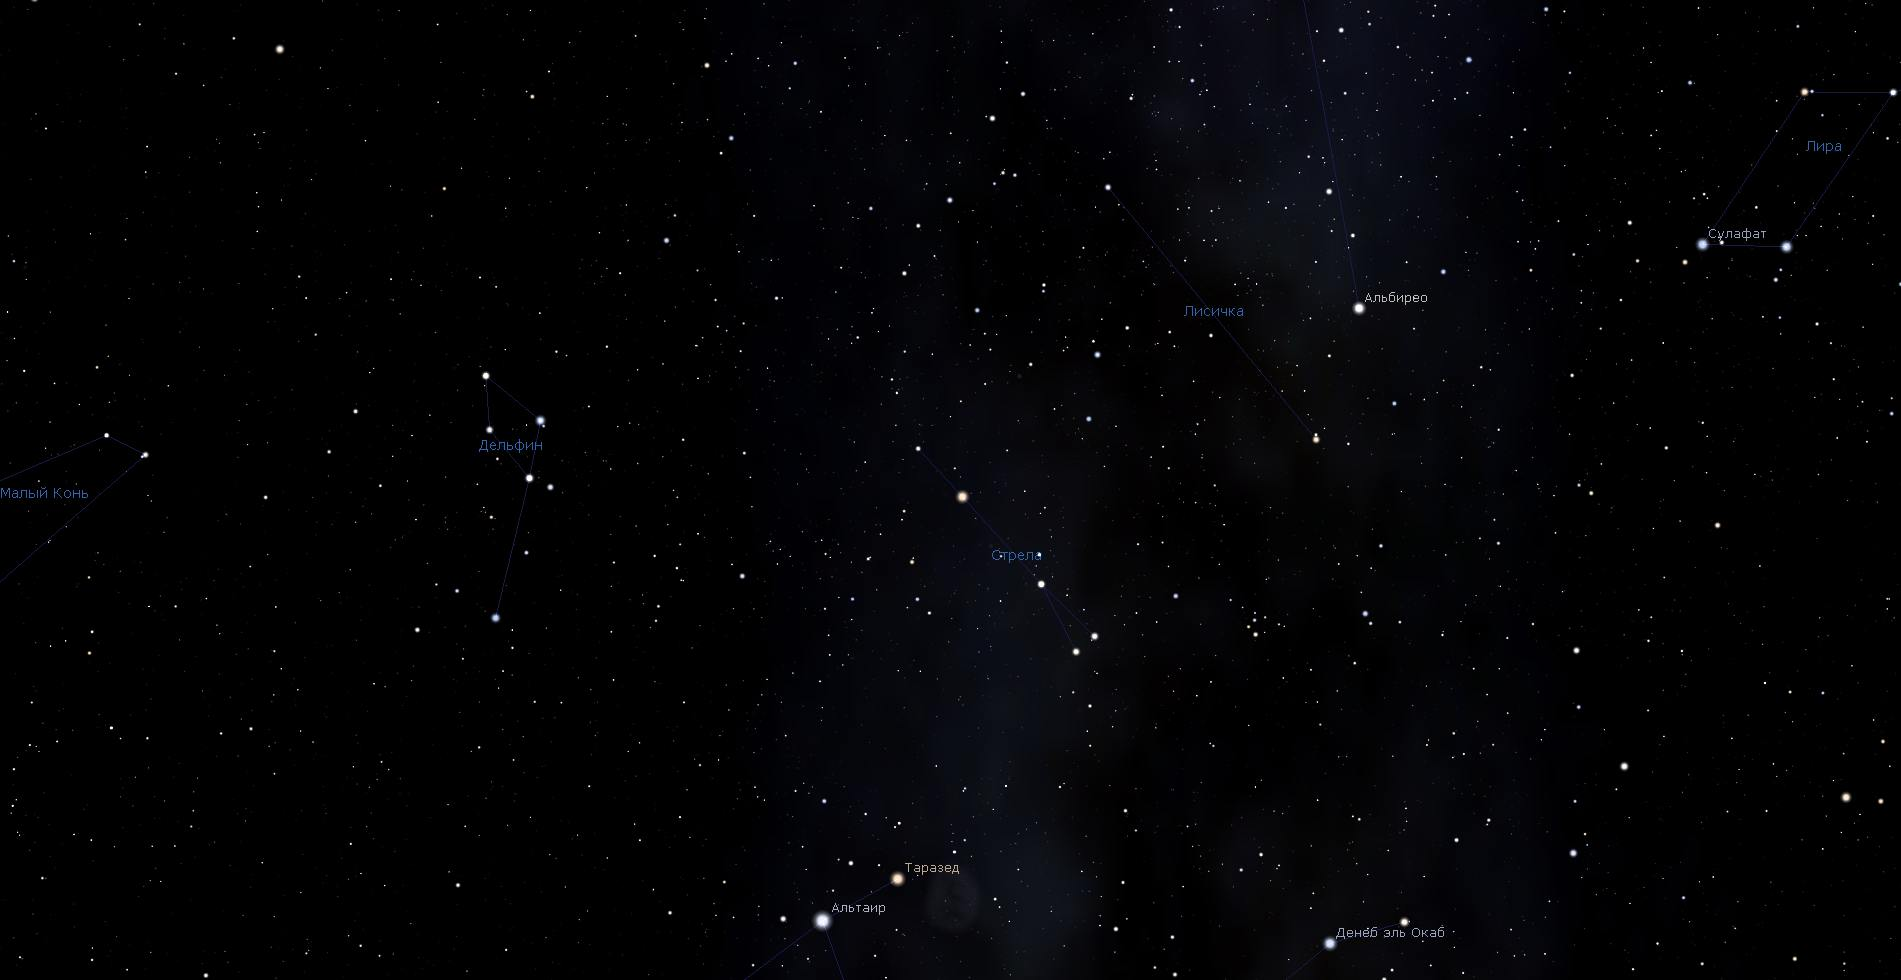 Созвездие Стрела, вид в программу планетарий Stellarium